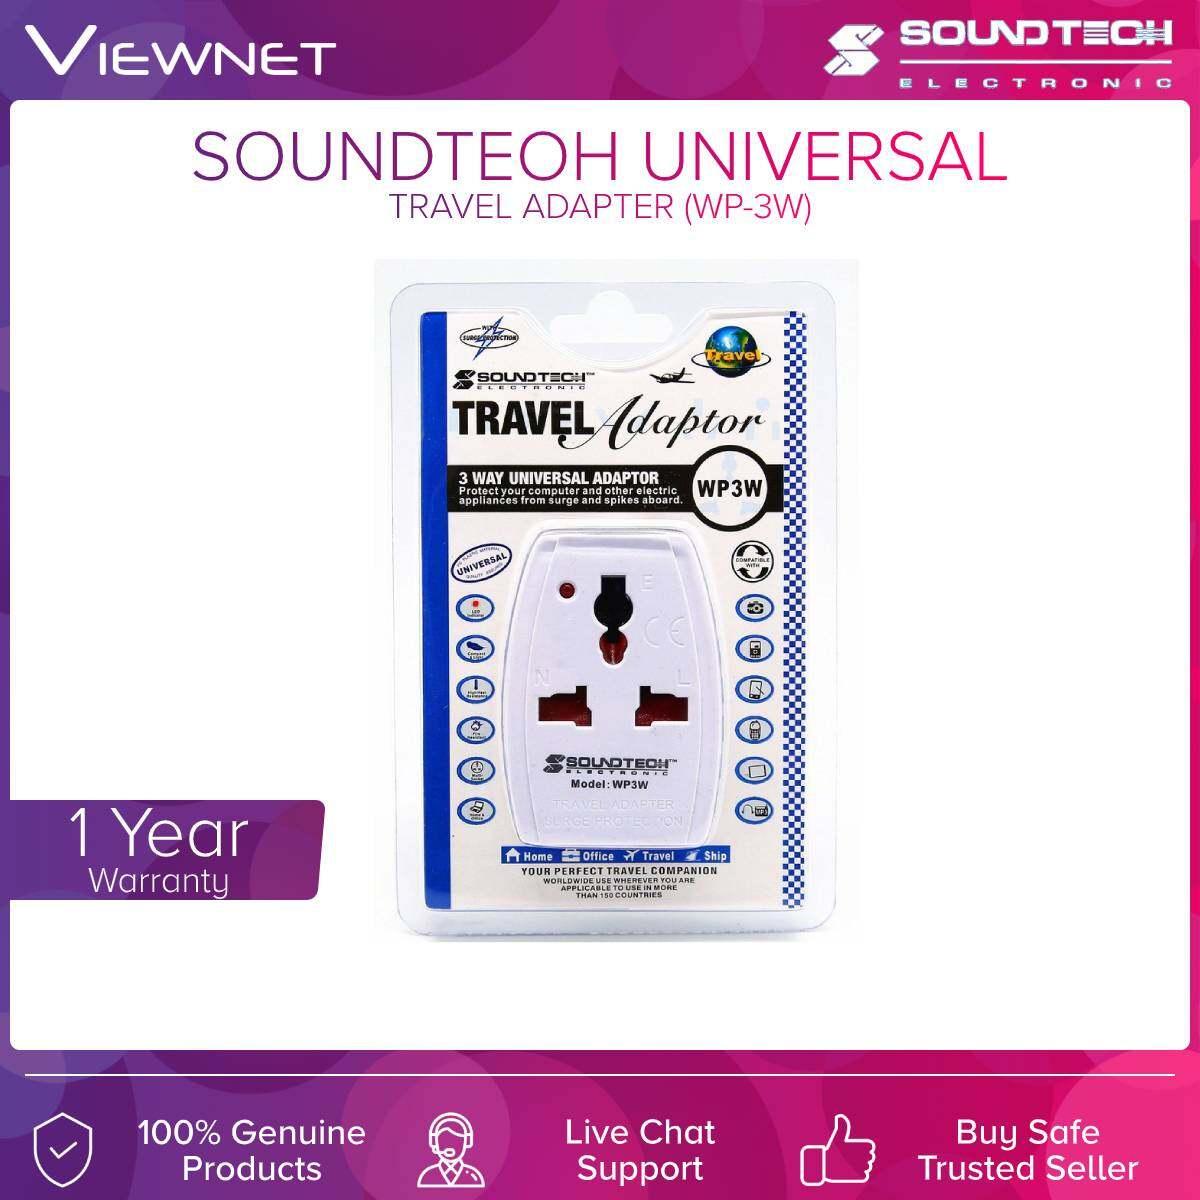 Soundteoh (WP-3W) Universal Travel Adapter